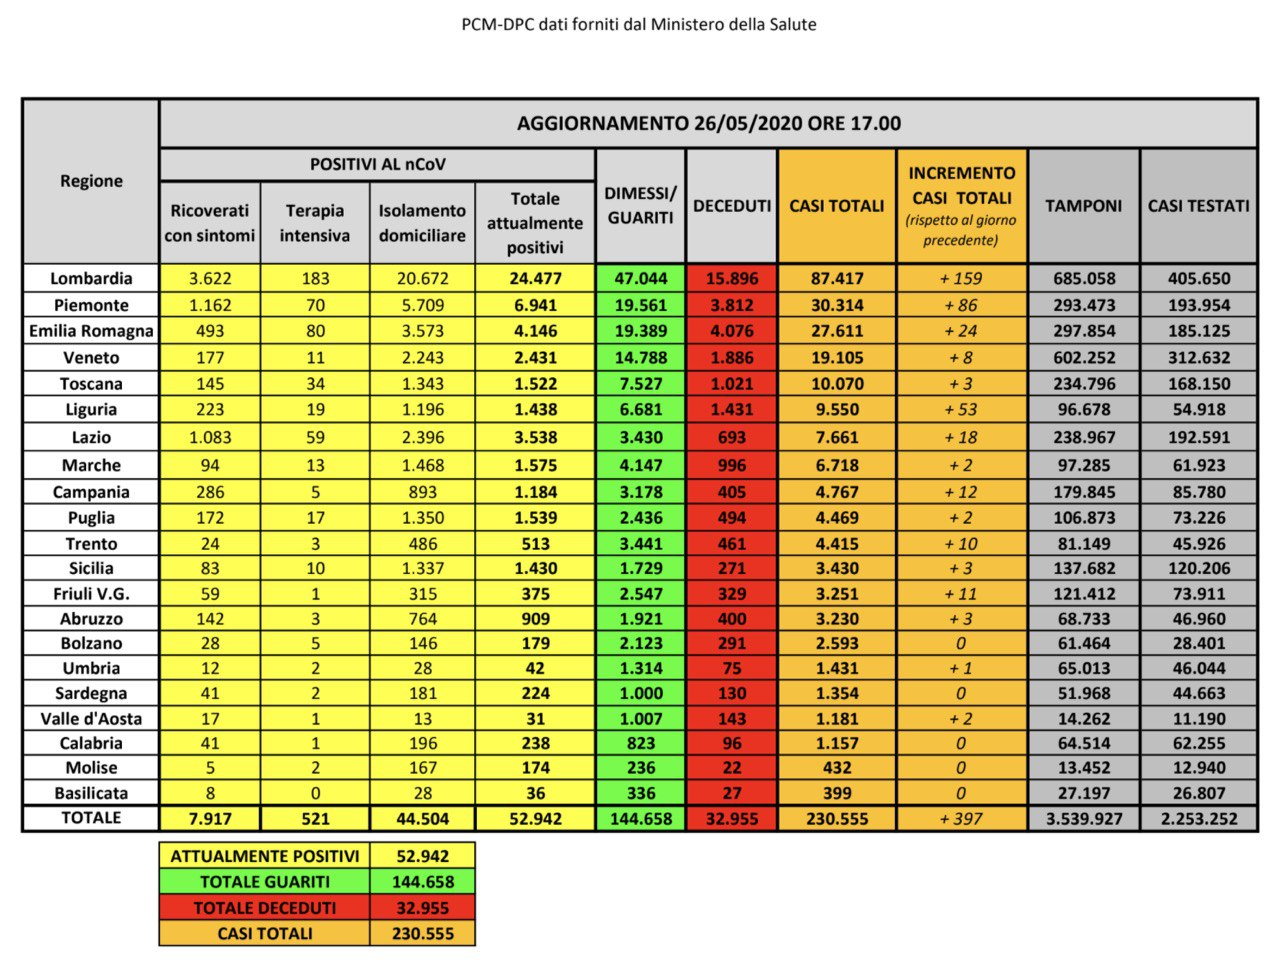 26.05.20 - I dati in Italia